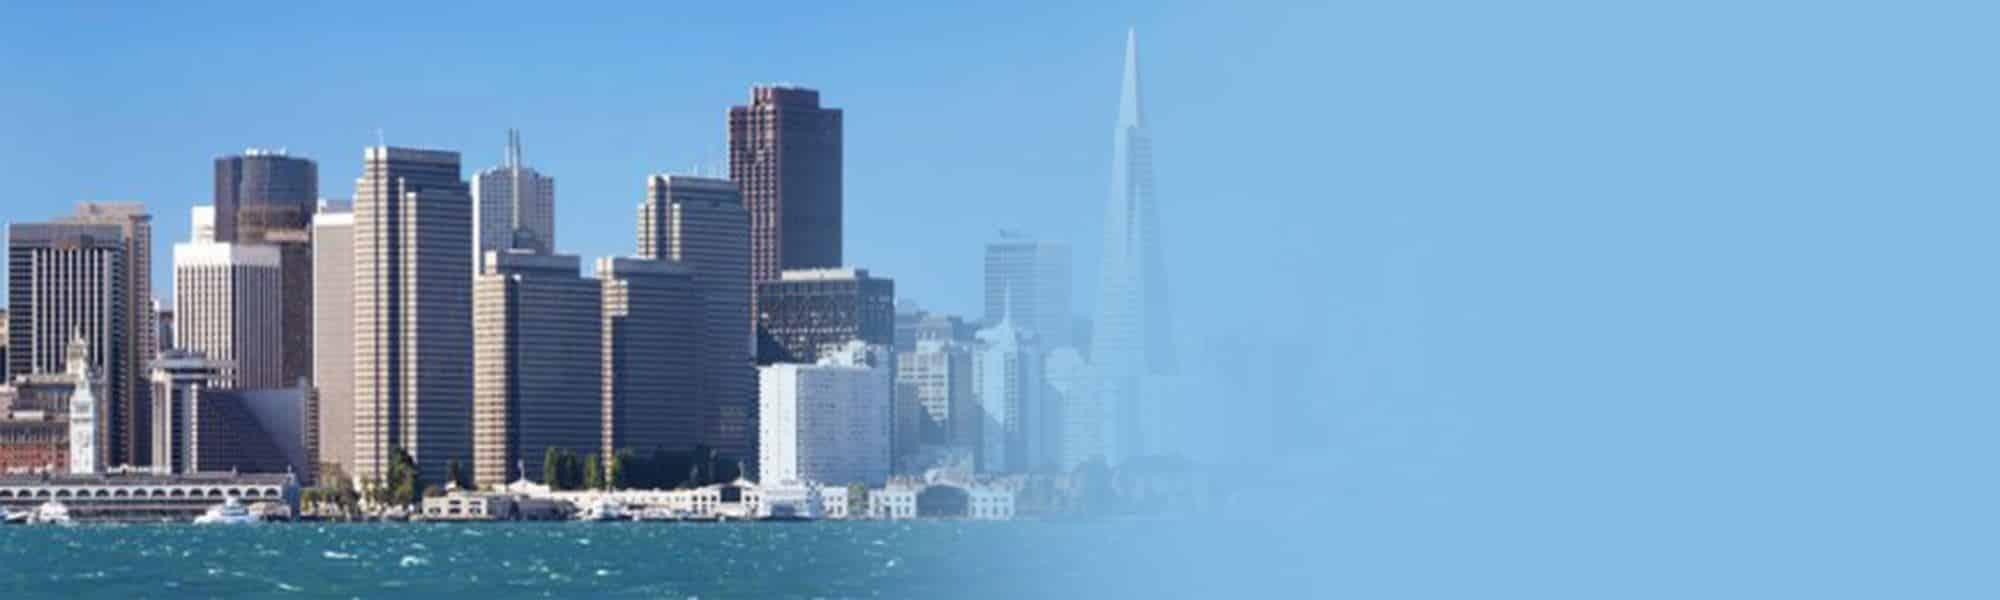 Image of San Francisco's skyline, representing international SEO